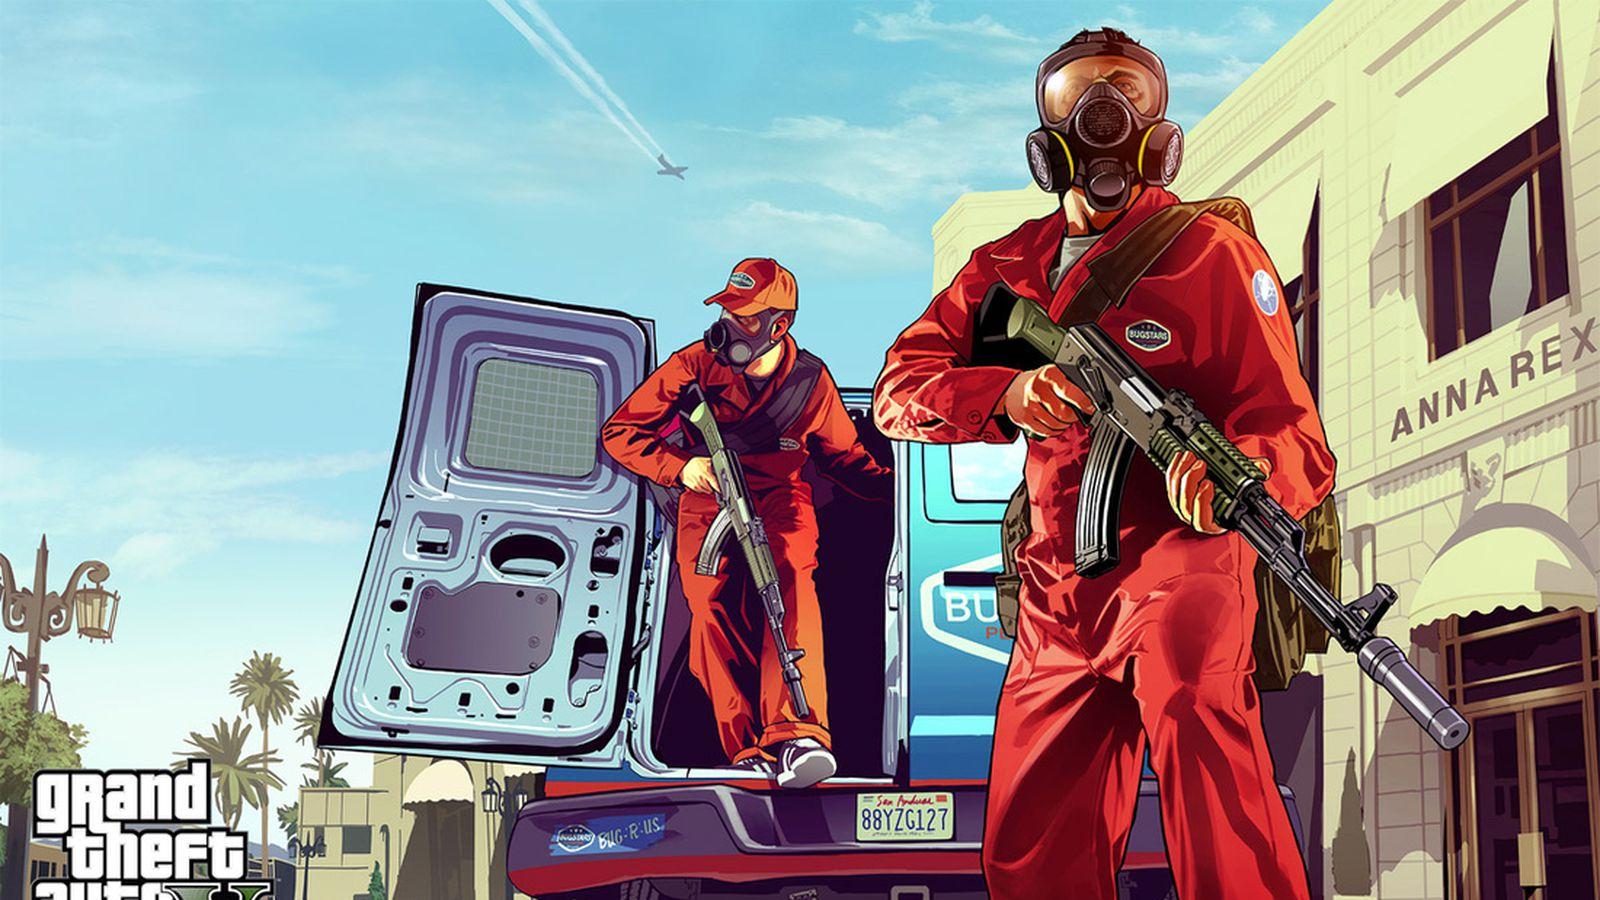 Grand Theft Auto 5 sales top 80 million